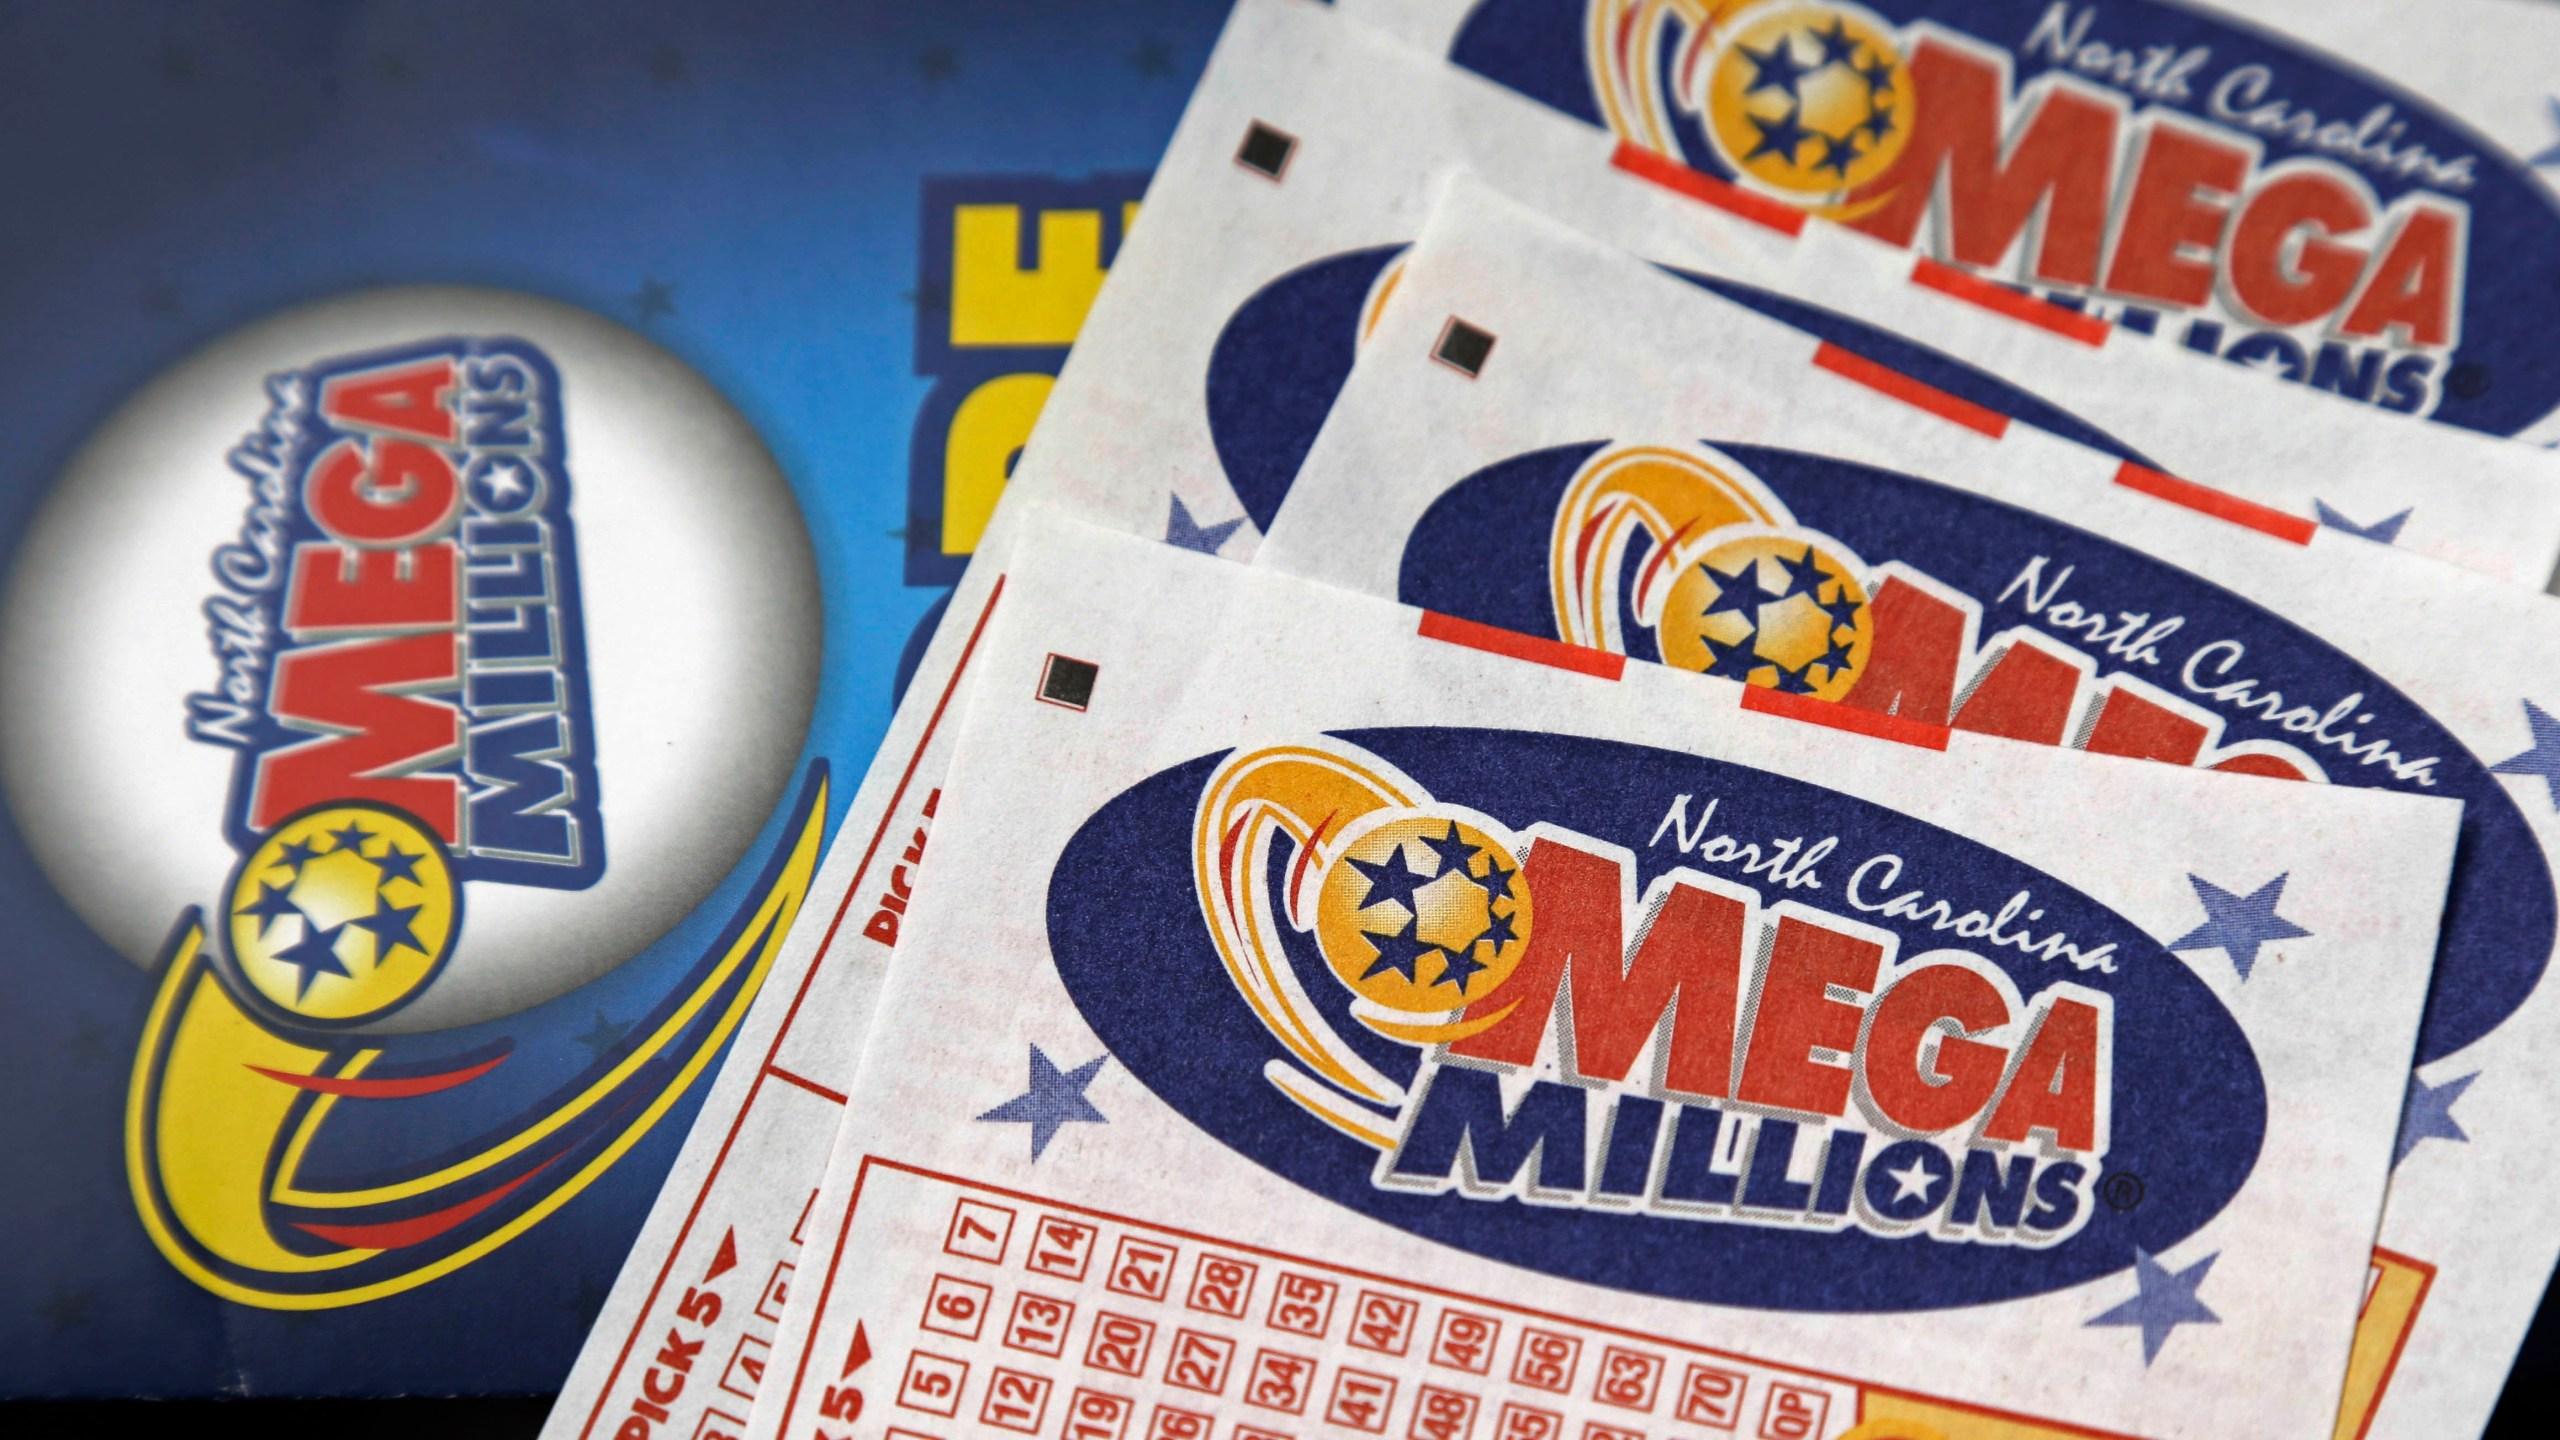 Lottery_Jackpot_95776-159532-159532.jpg77444363